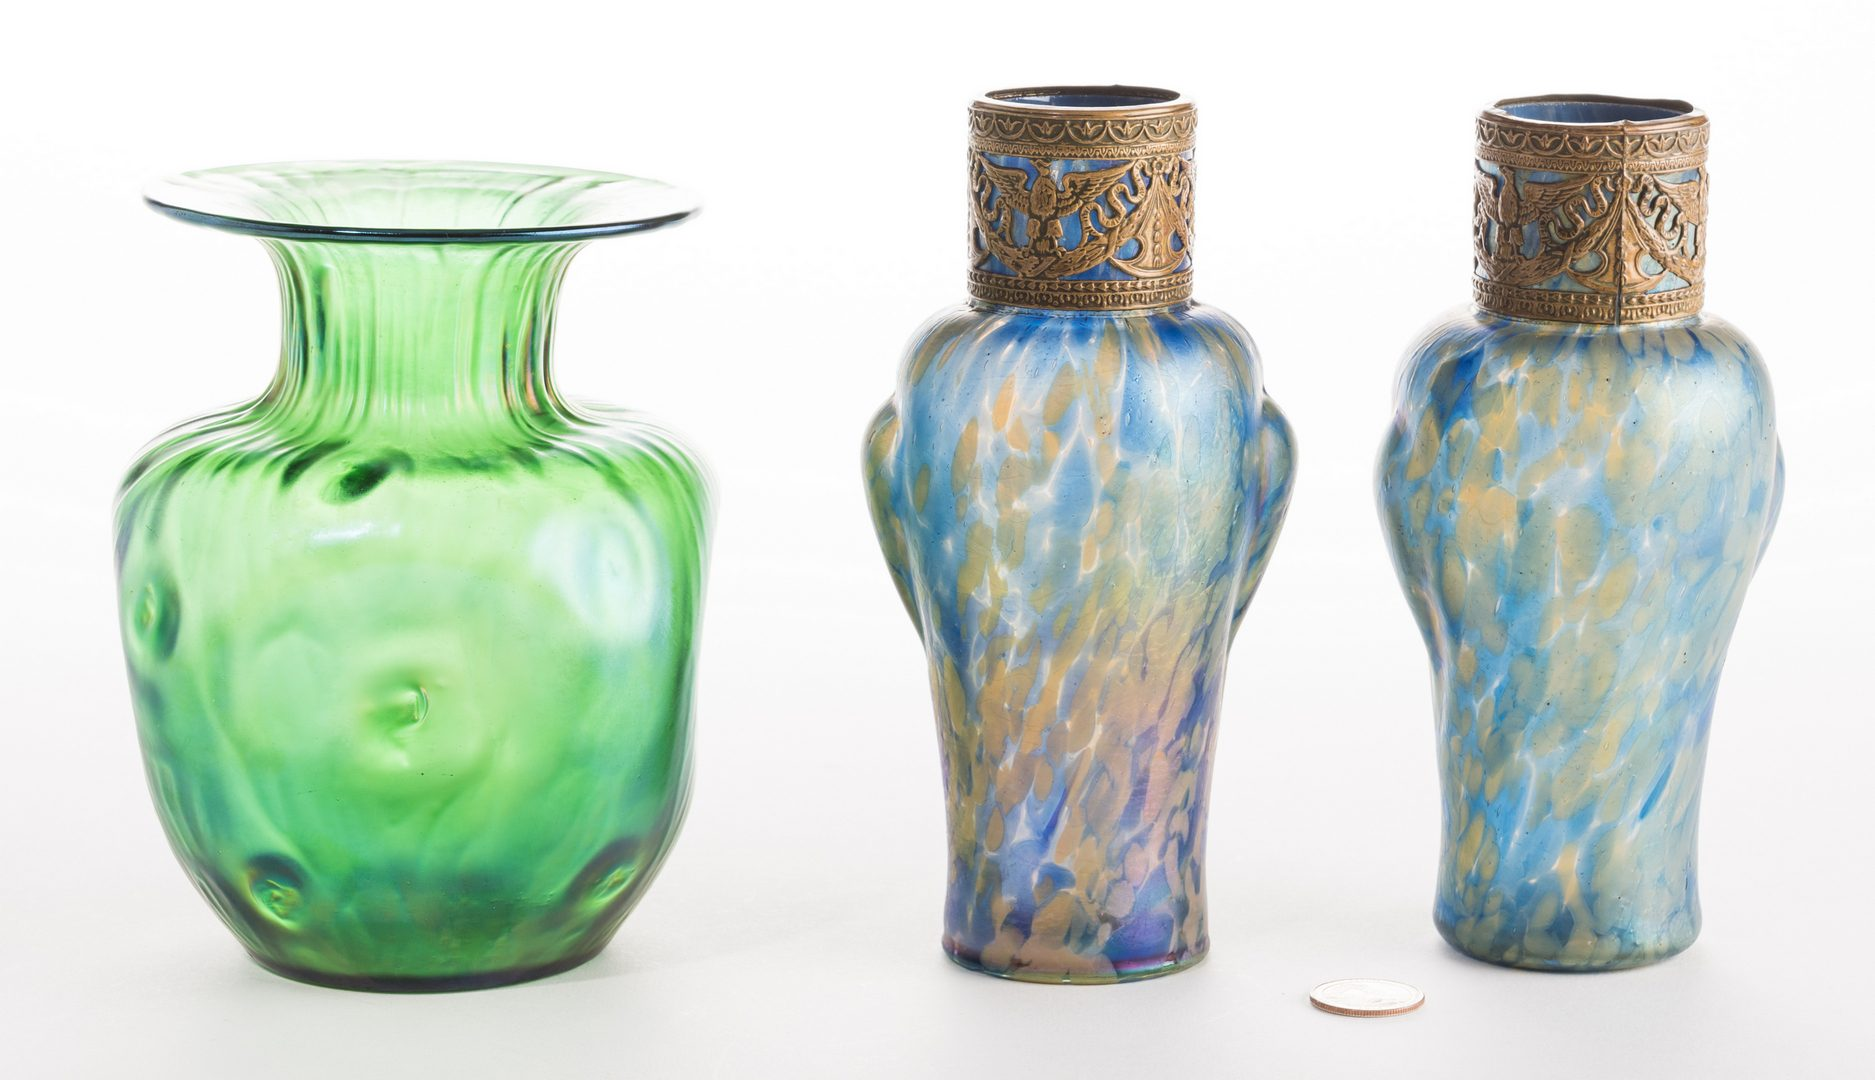 Lot 517: Attr. Loetz or Kralik Art glass Group, 3 pcs